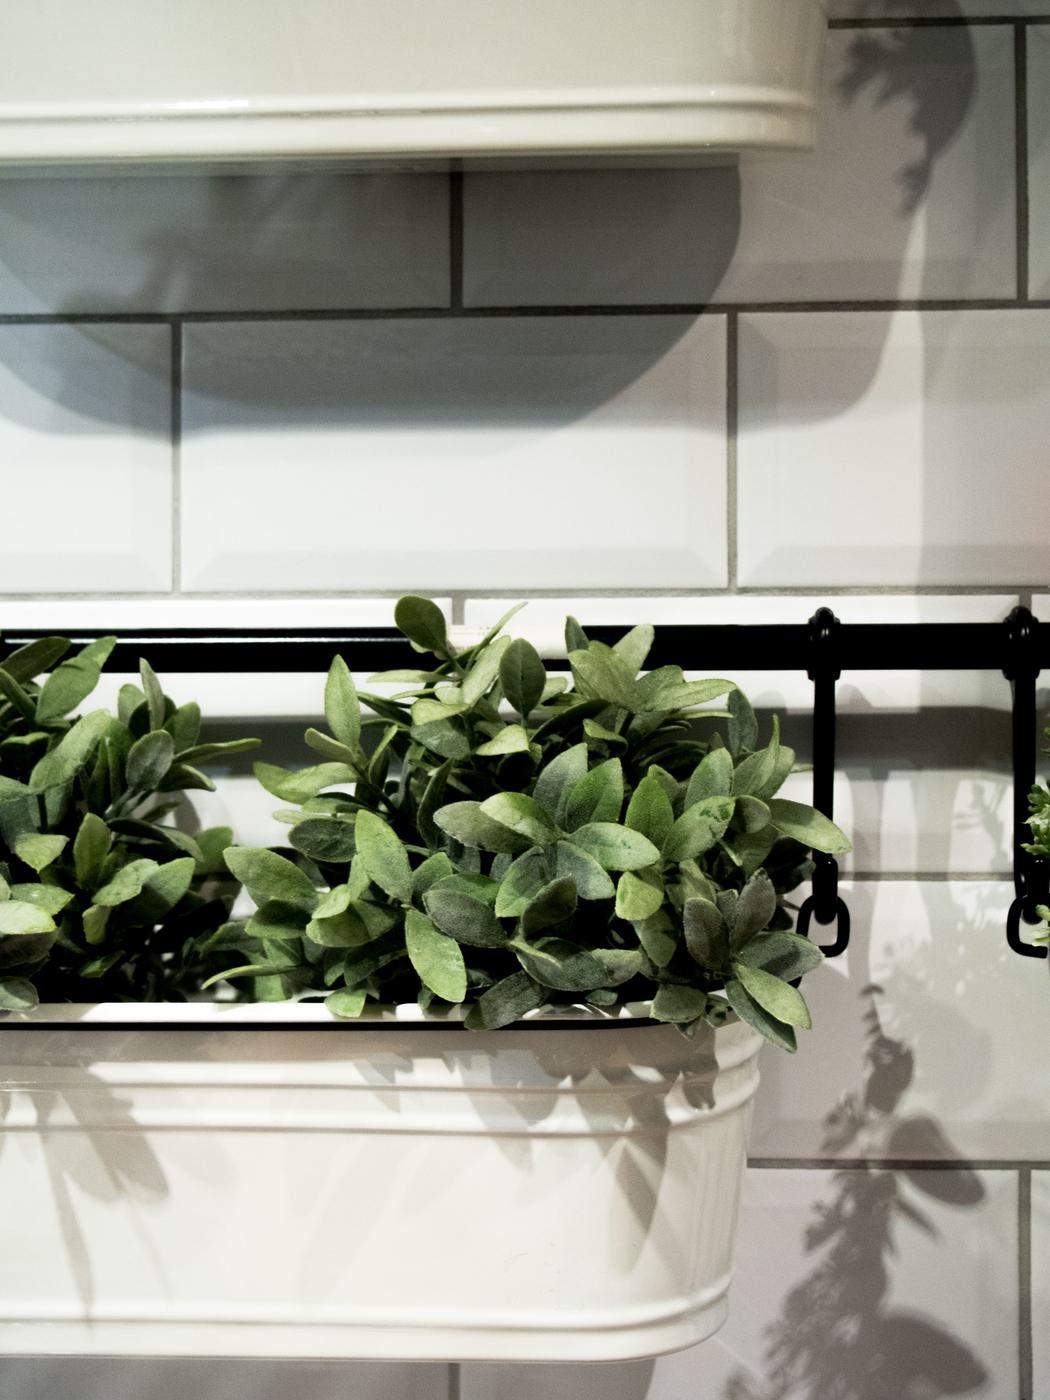 IKEA-6210494.jpg